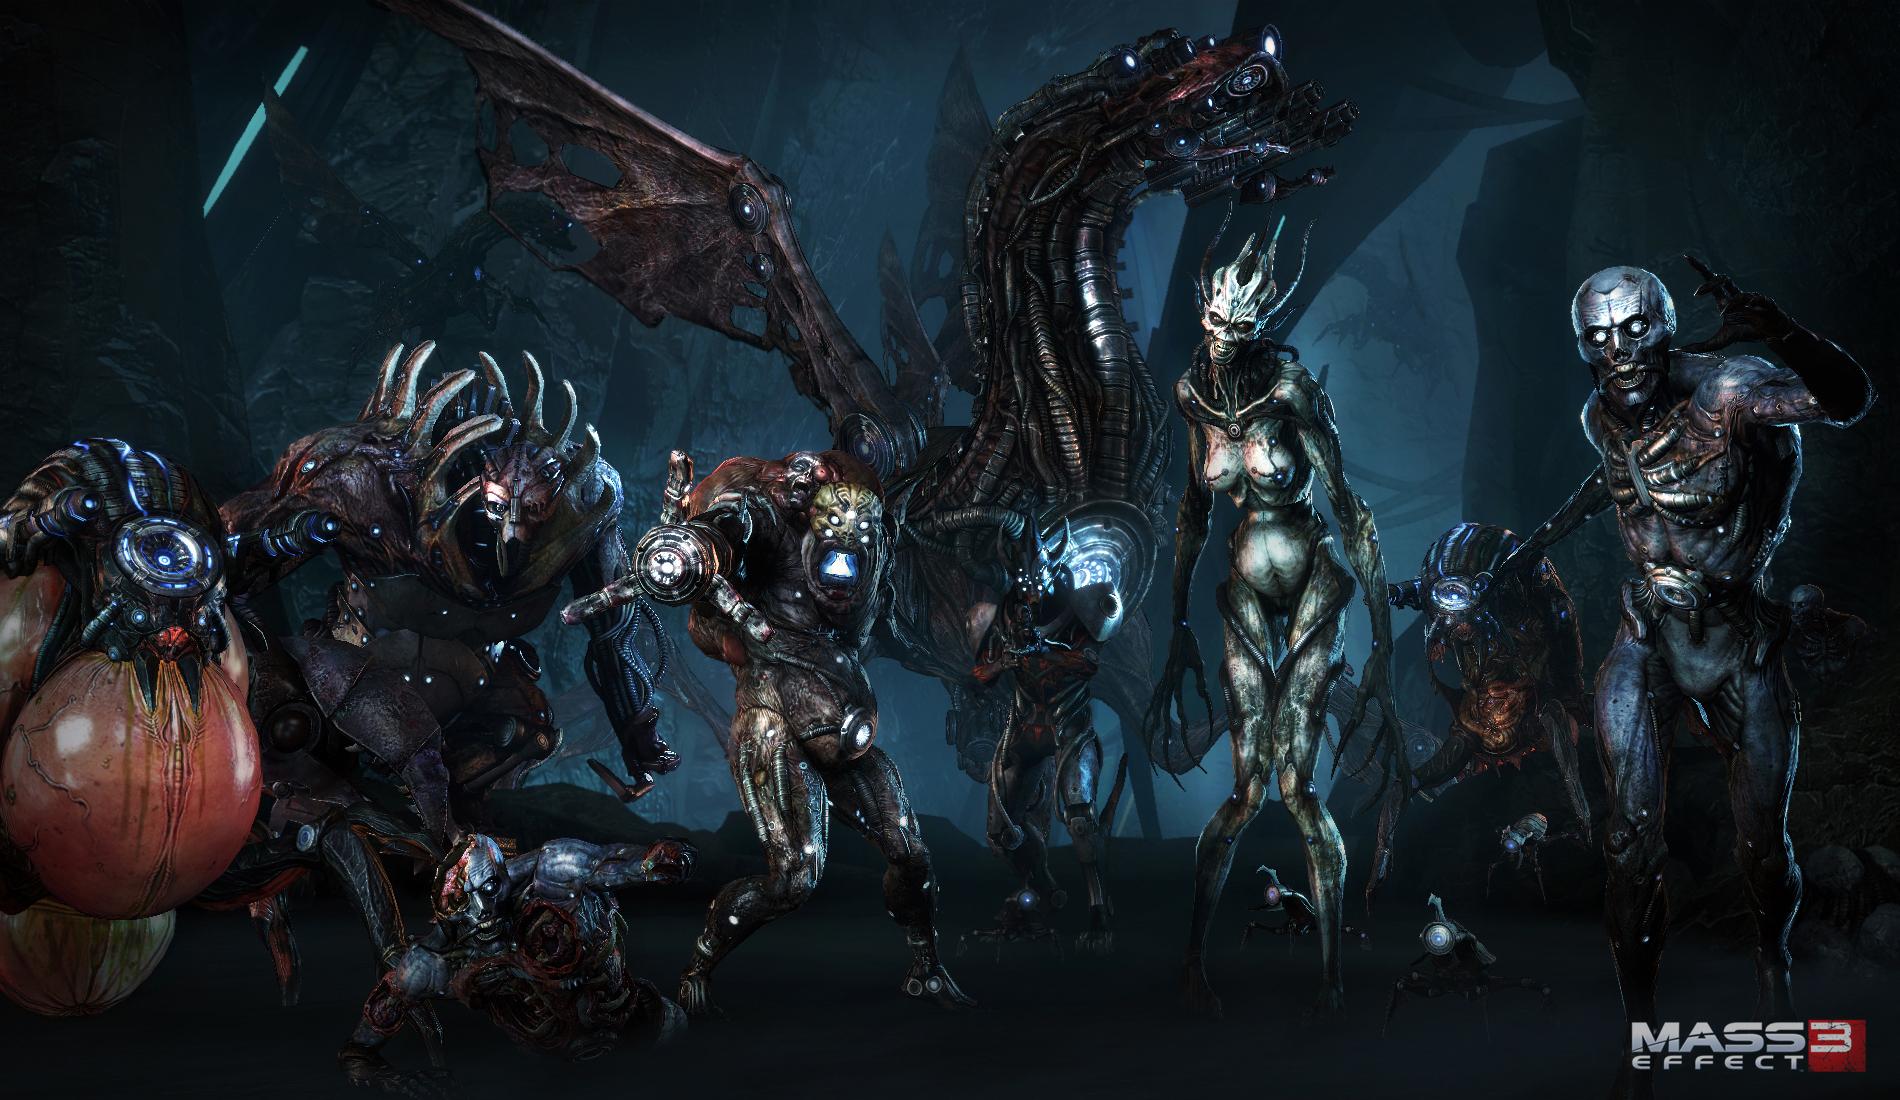 Арт к игре Mass Effect 3